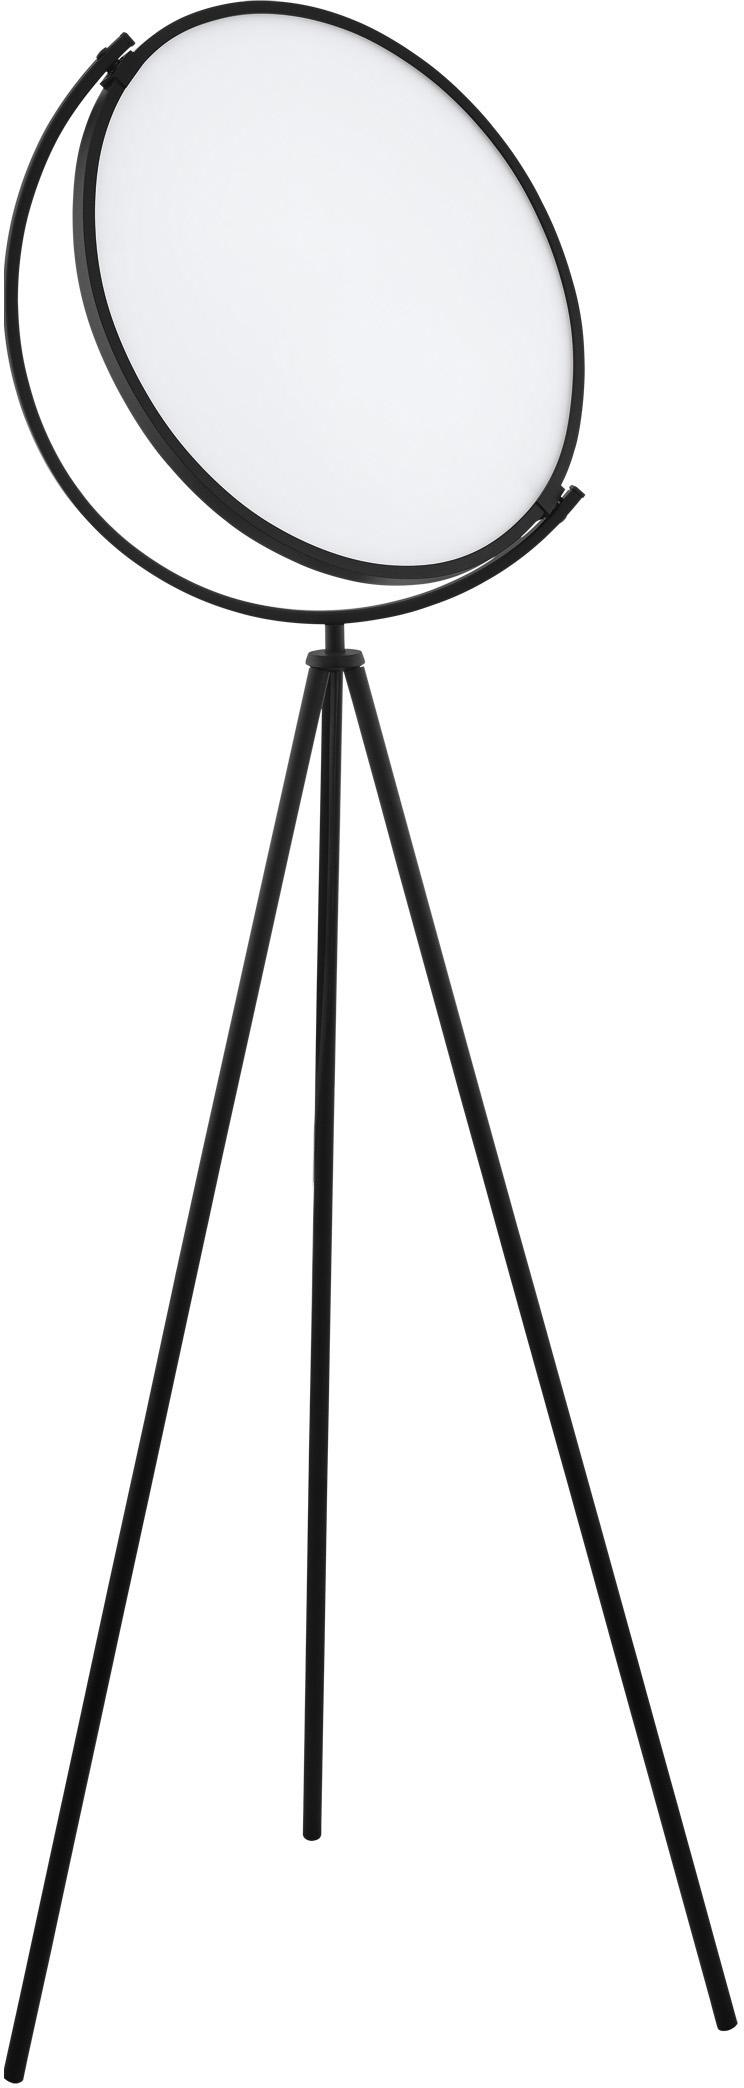 LED Tripod Stehlampe Renitale, Diffusorscheibe: Kunststoff, Lampenfuß: Metall, lackiert, Schwarz, Ø 43 x H 153 cm